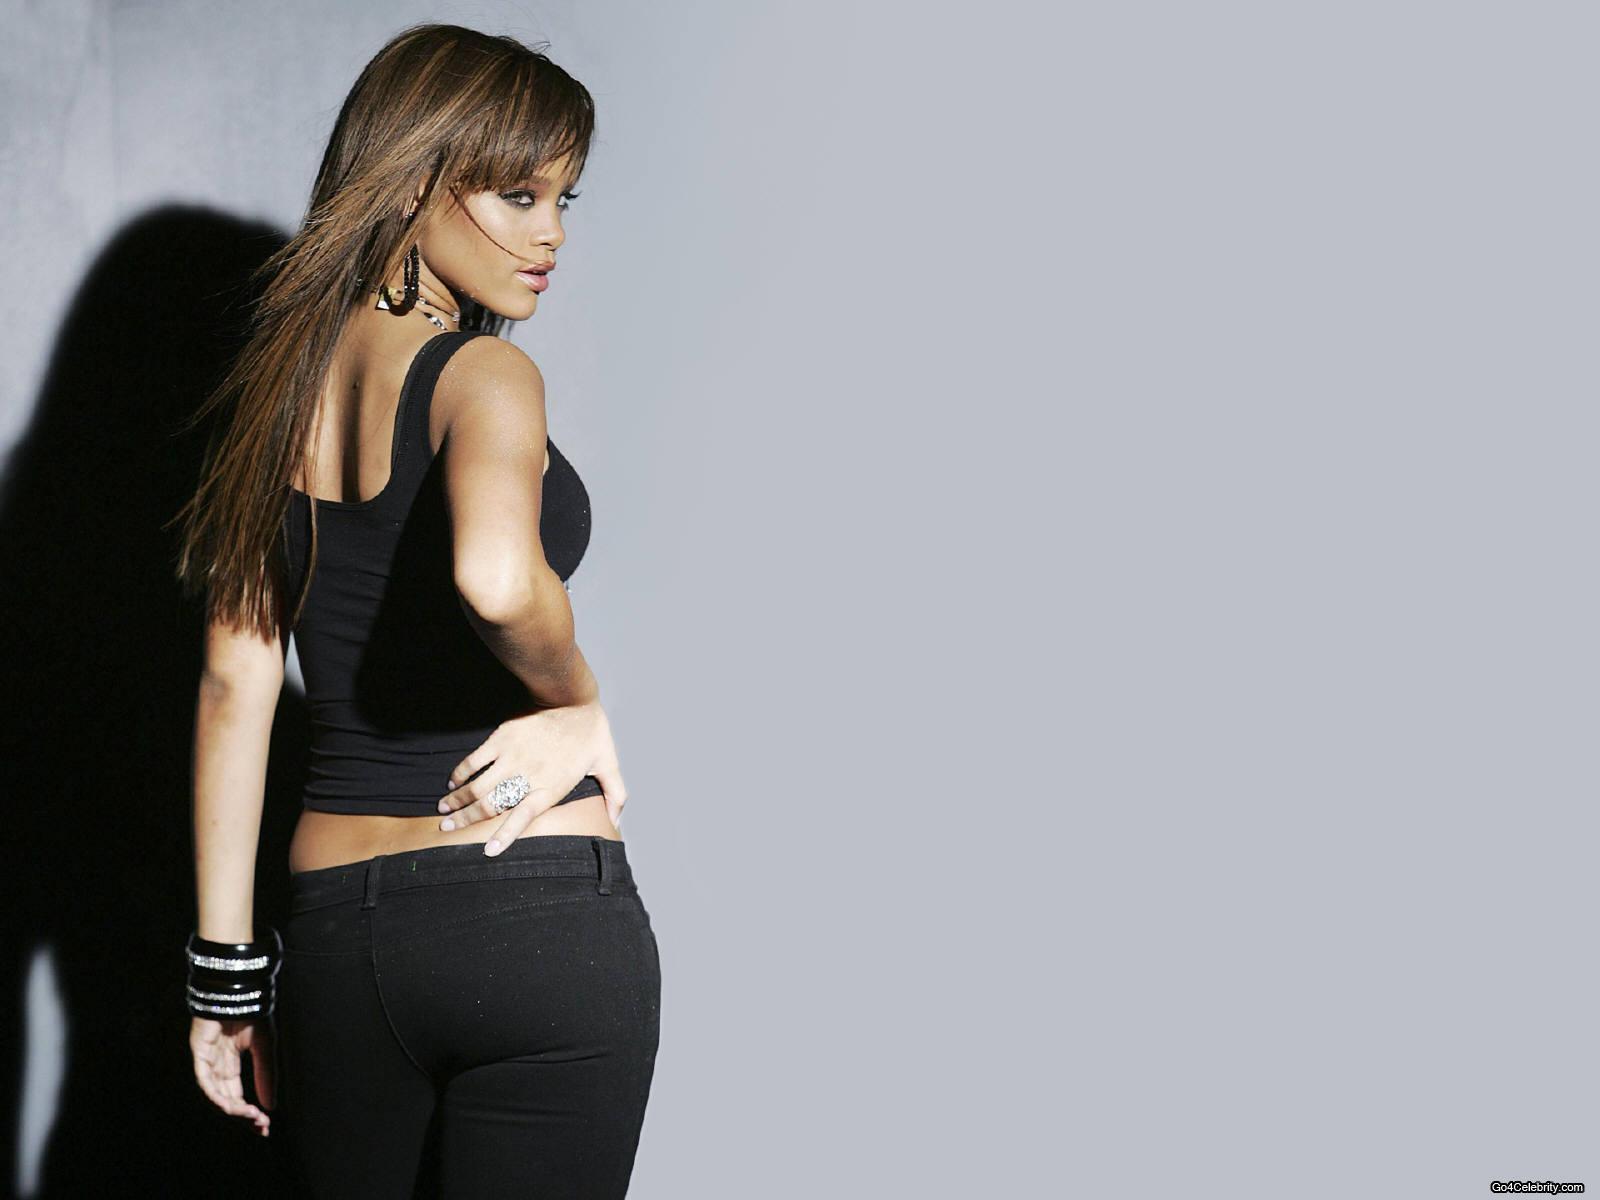 http://images2.fanpop.com/images/photos/6800000/Rihanna-rihanna-6848311-1600-1200.jpg